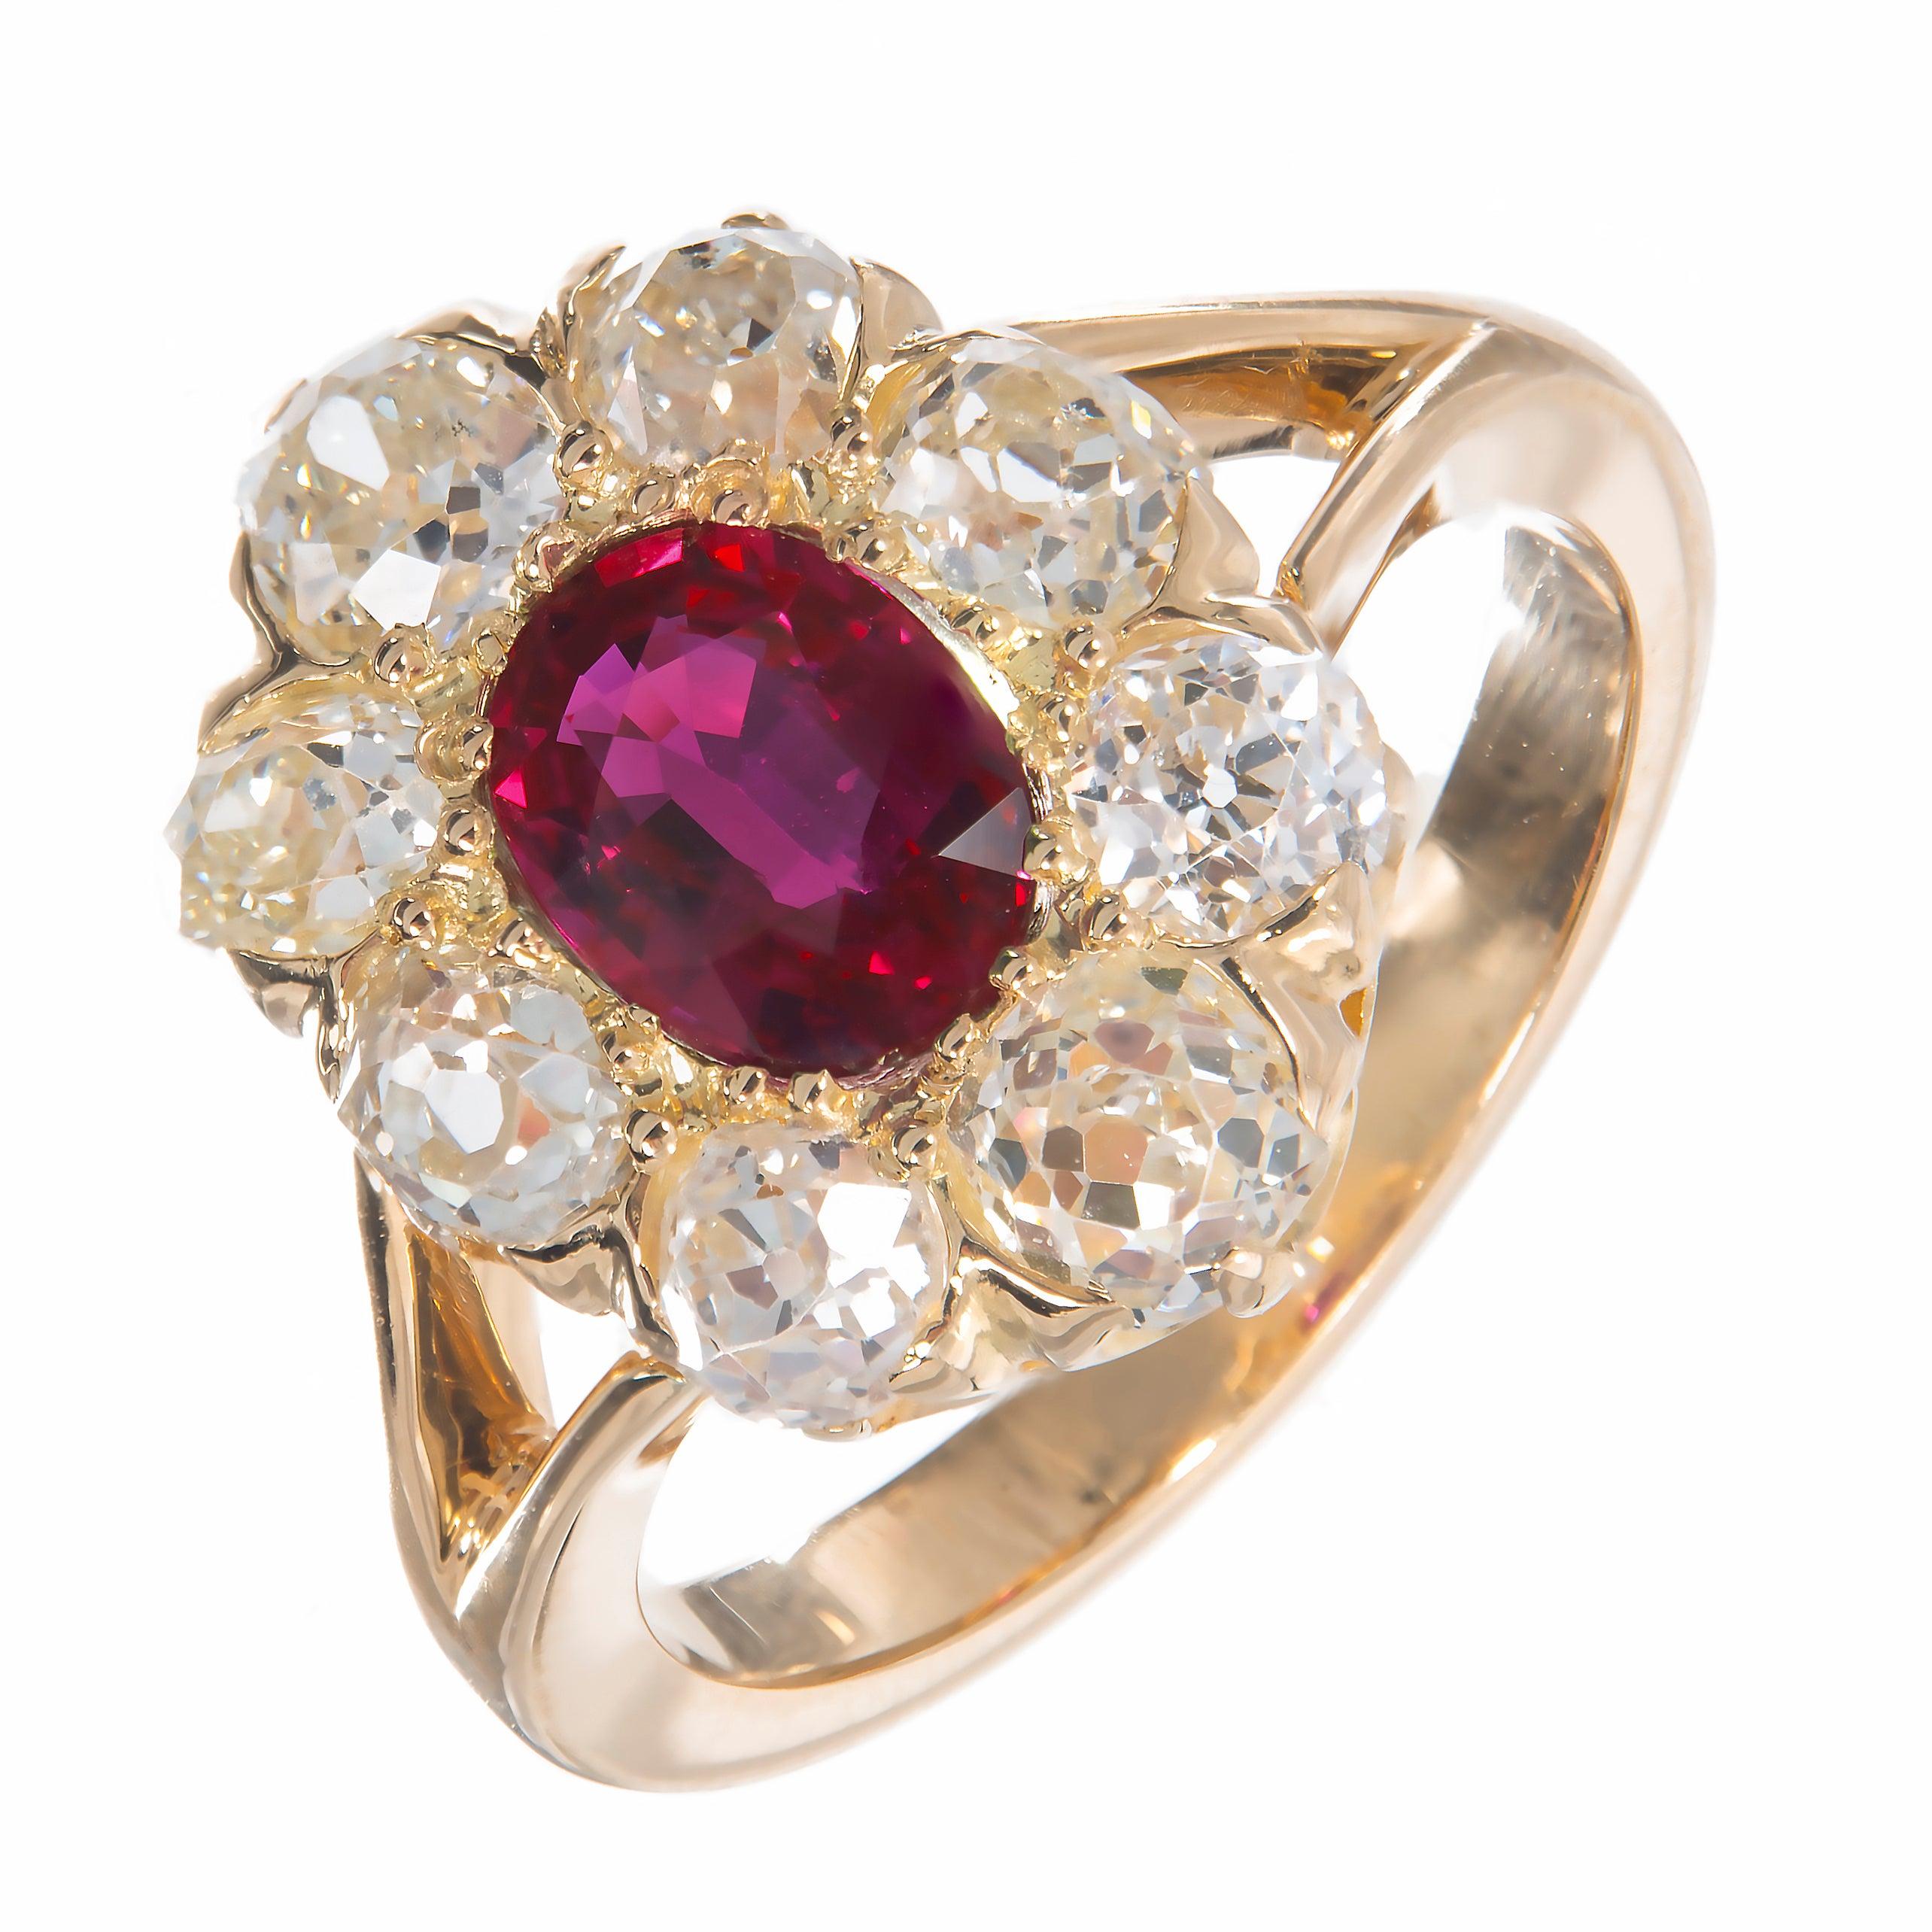 GIA Certified 1.17 Carat Ruby Diamond Halo Gold Engagement Ring